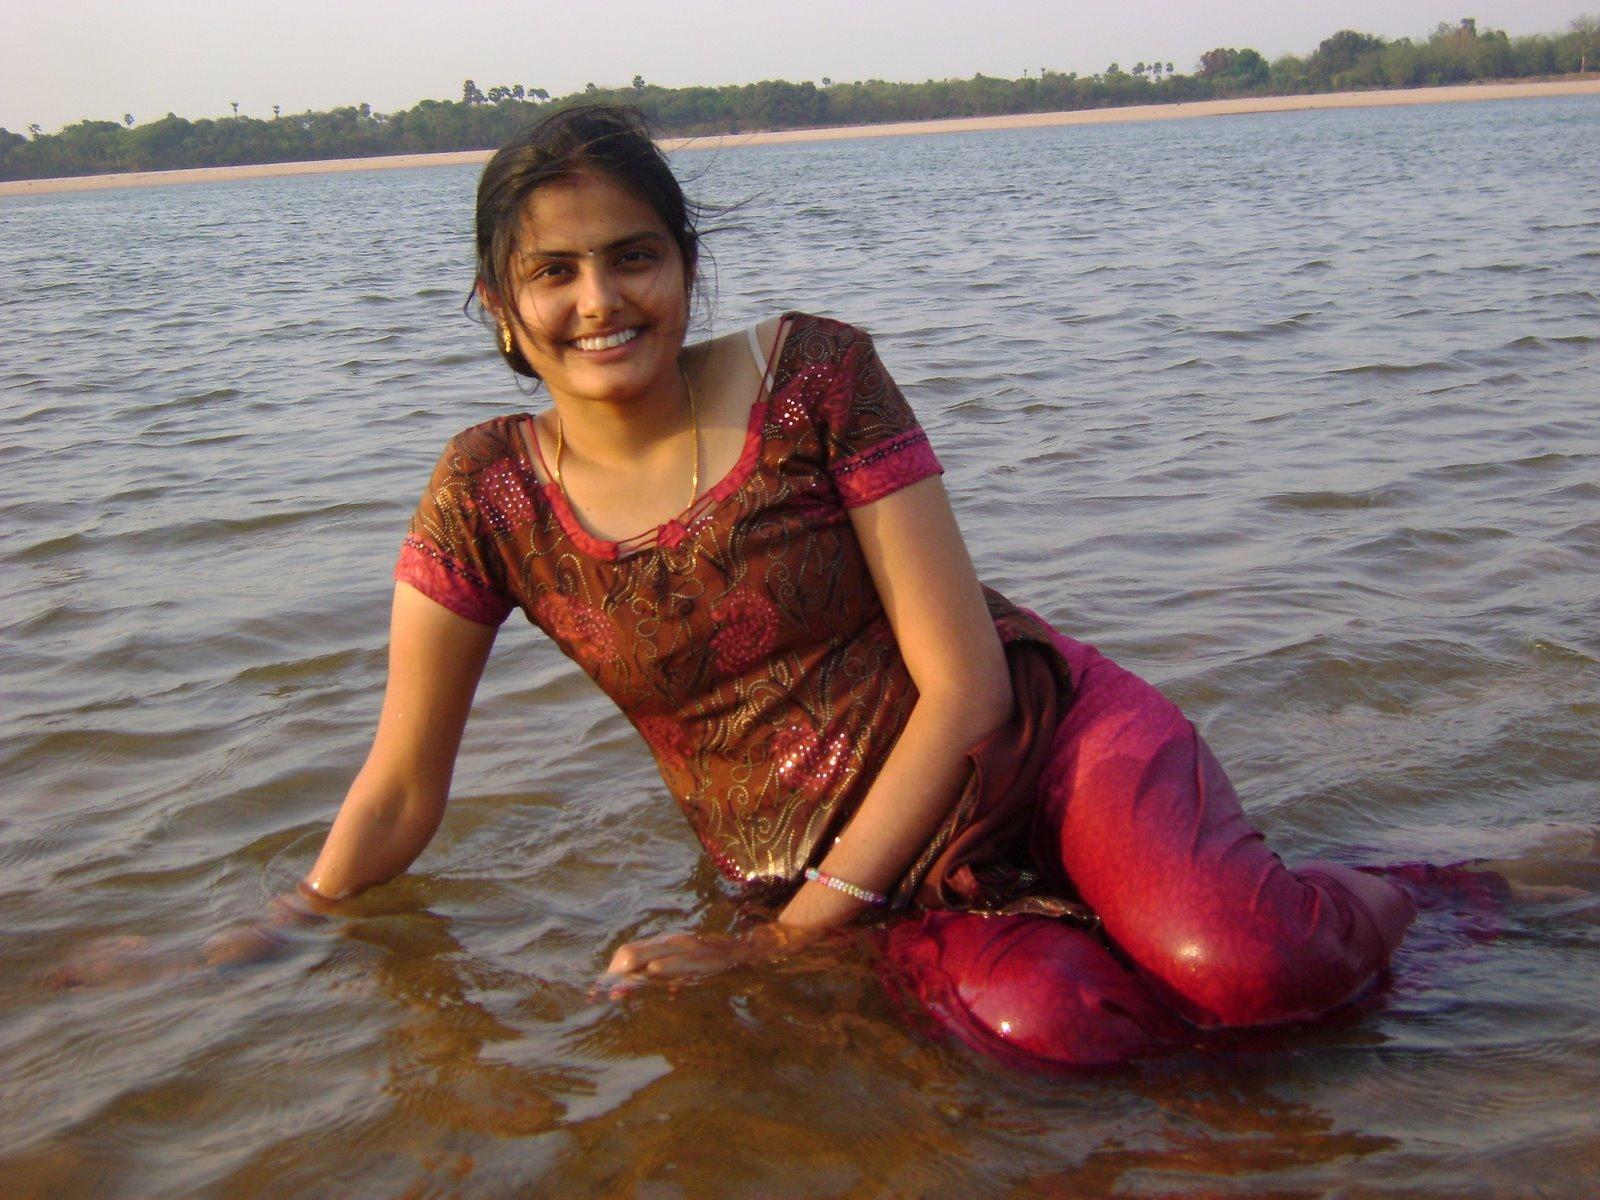 Bathing hot mallu girls